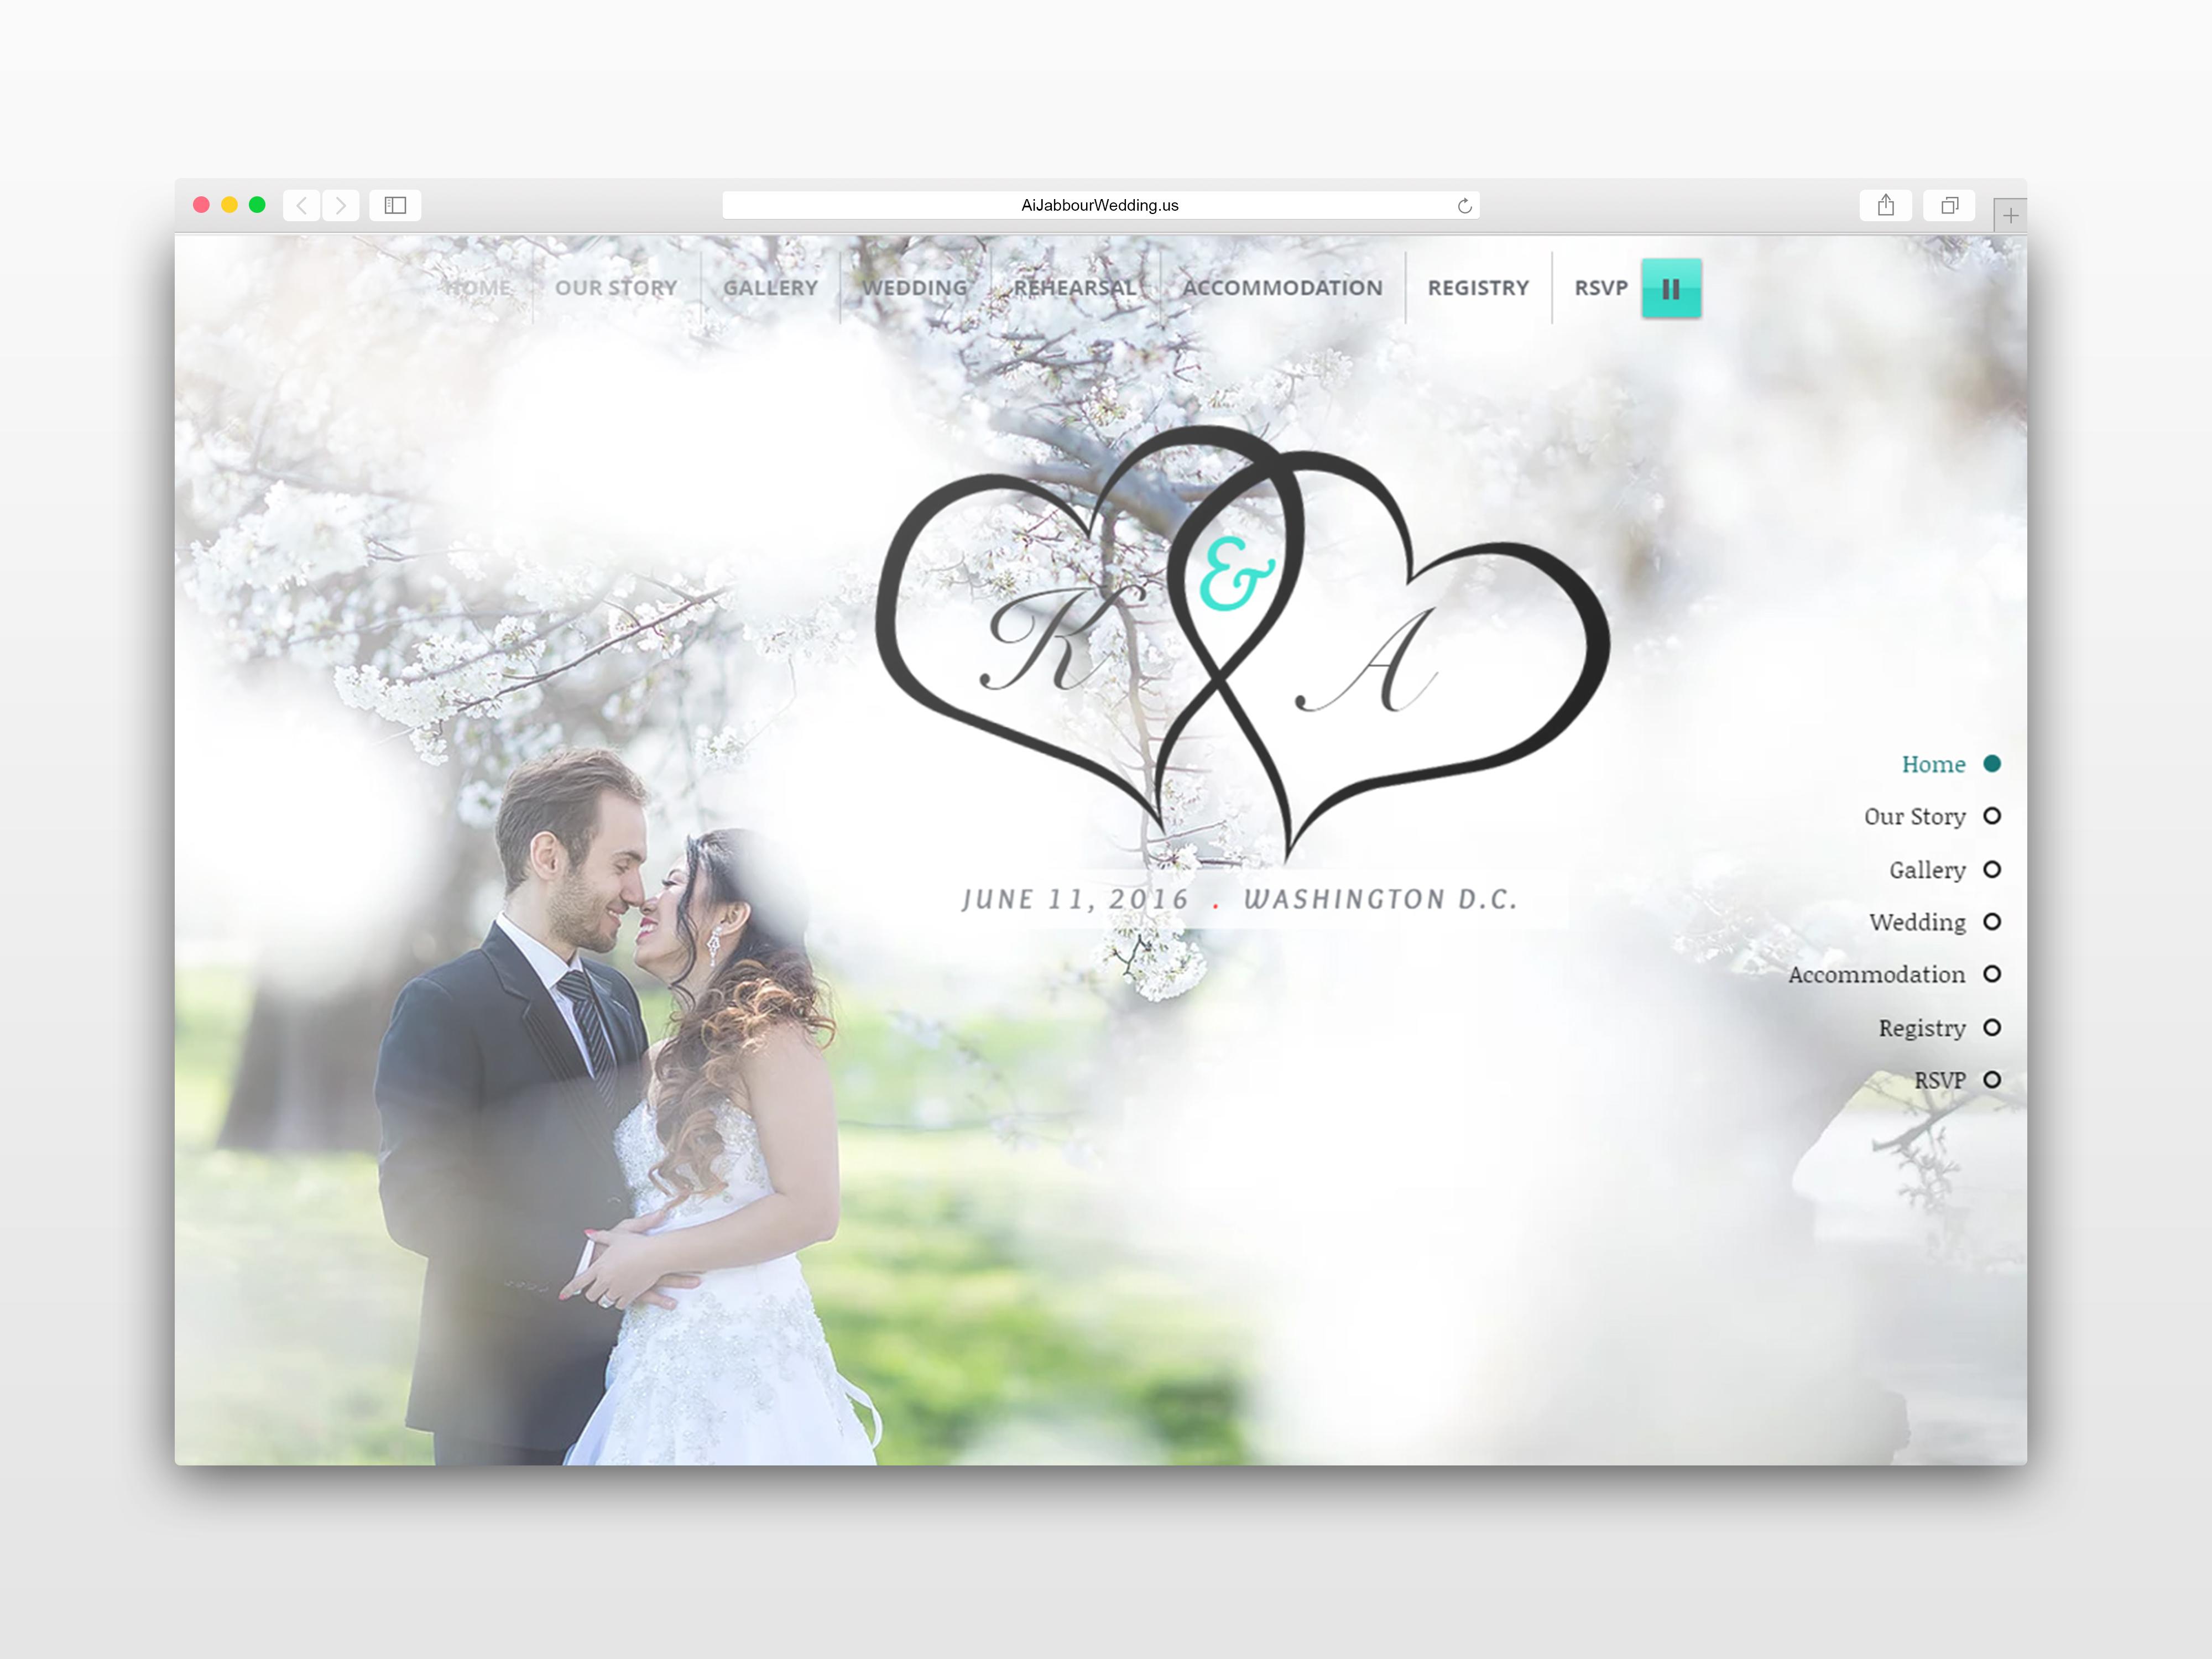 Safari_Wedding_AjLizzie_Mockup